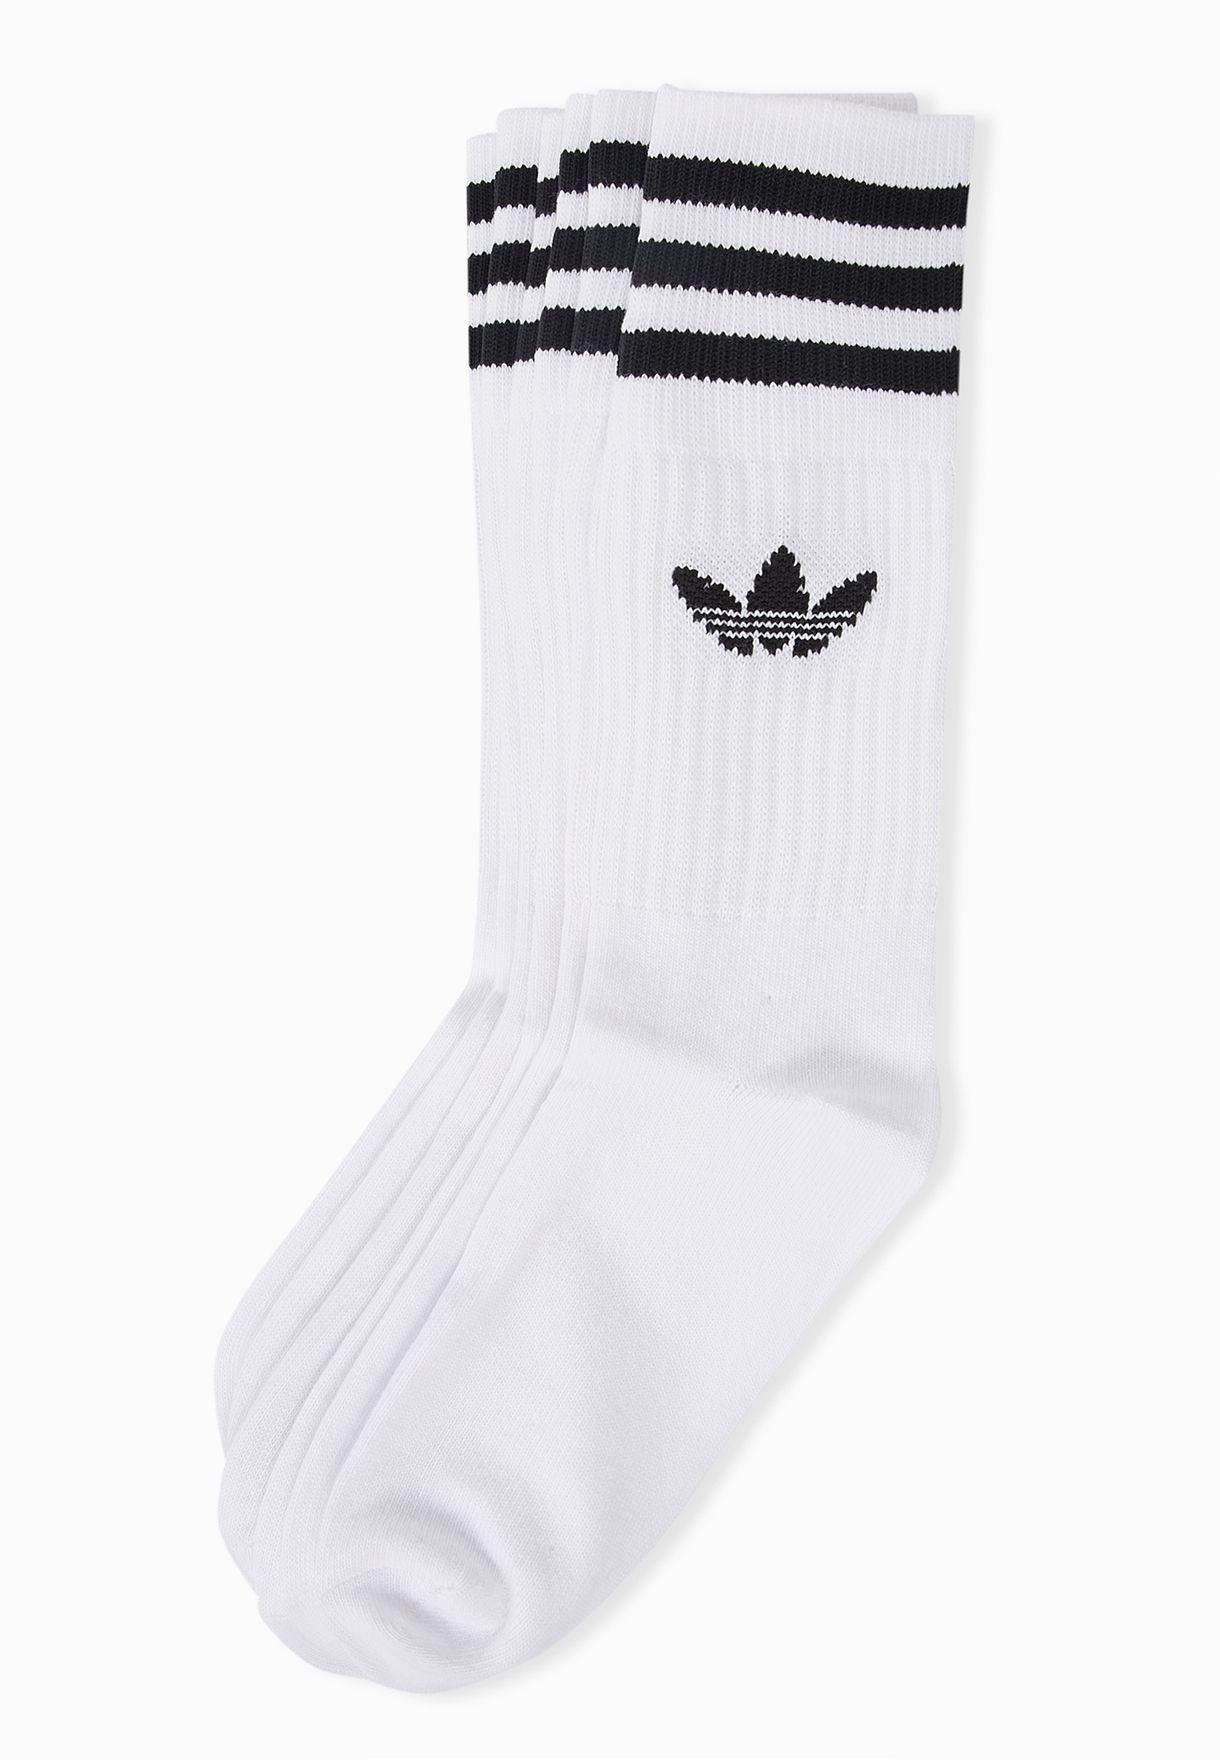 057d20b38dc656 Shop adidas Originals white 3 Pack Trefoil Socks S21489 for Men in Qatar -  AD478AT18BCR